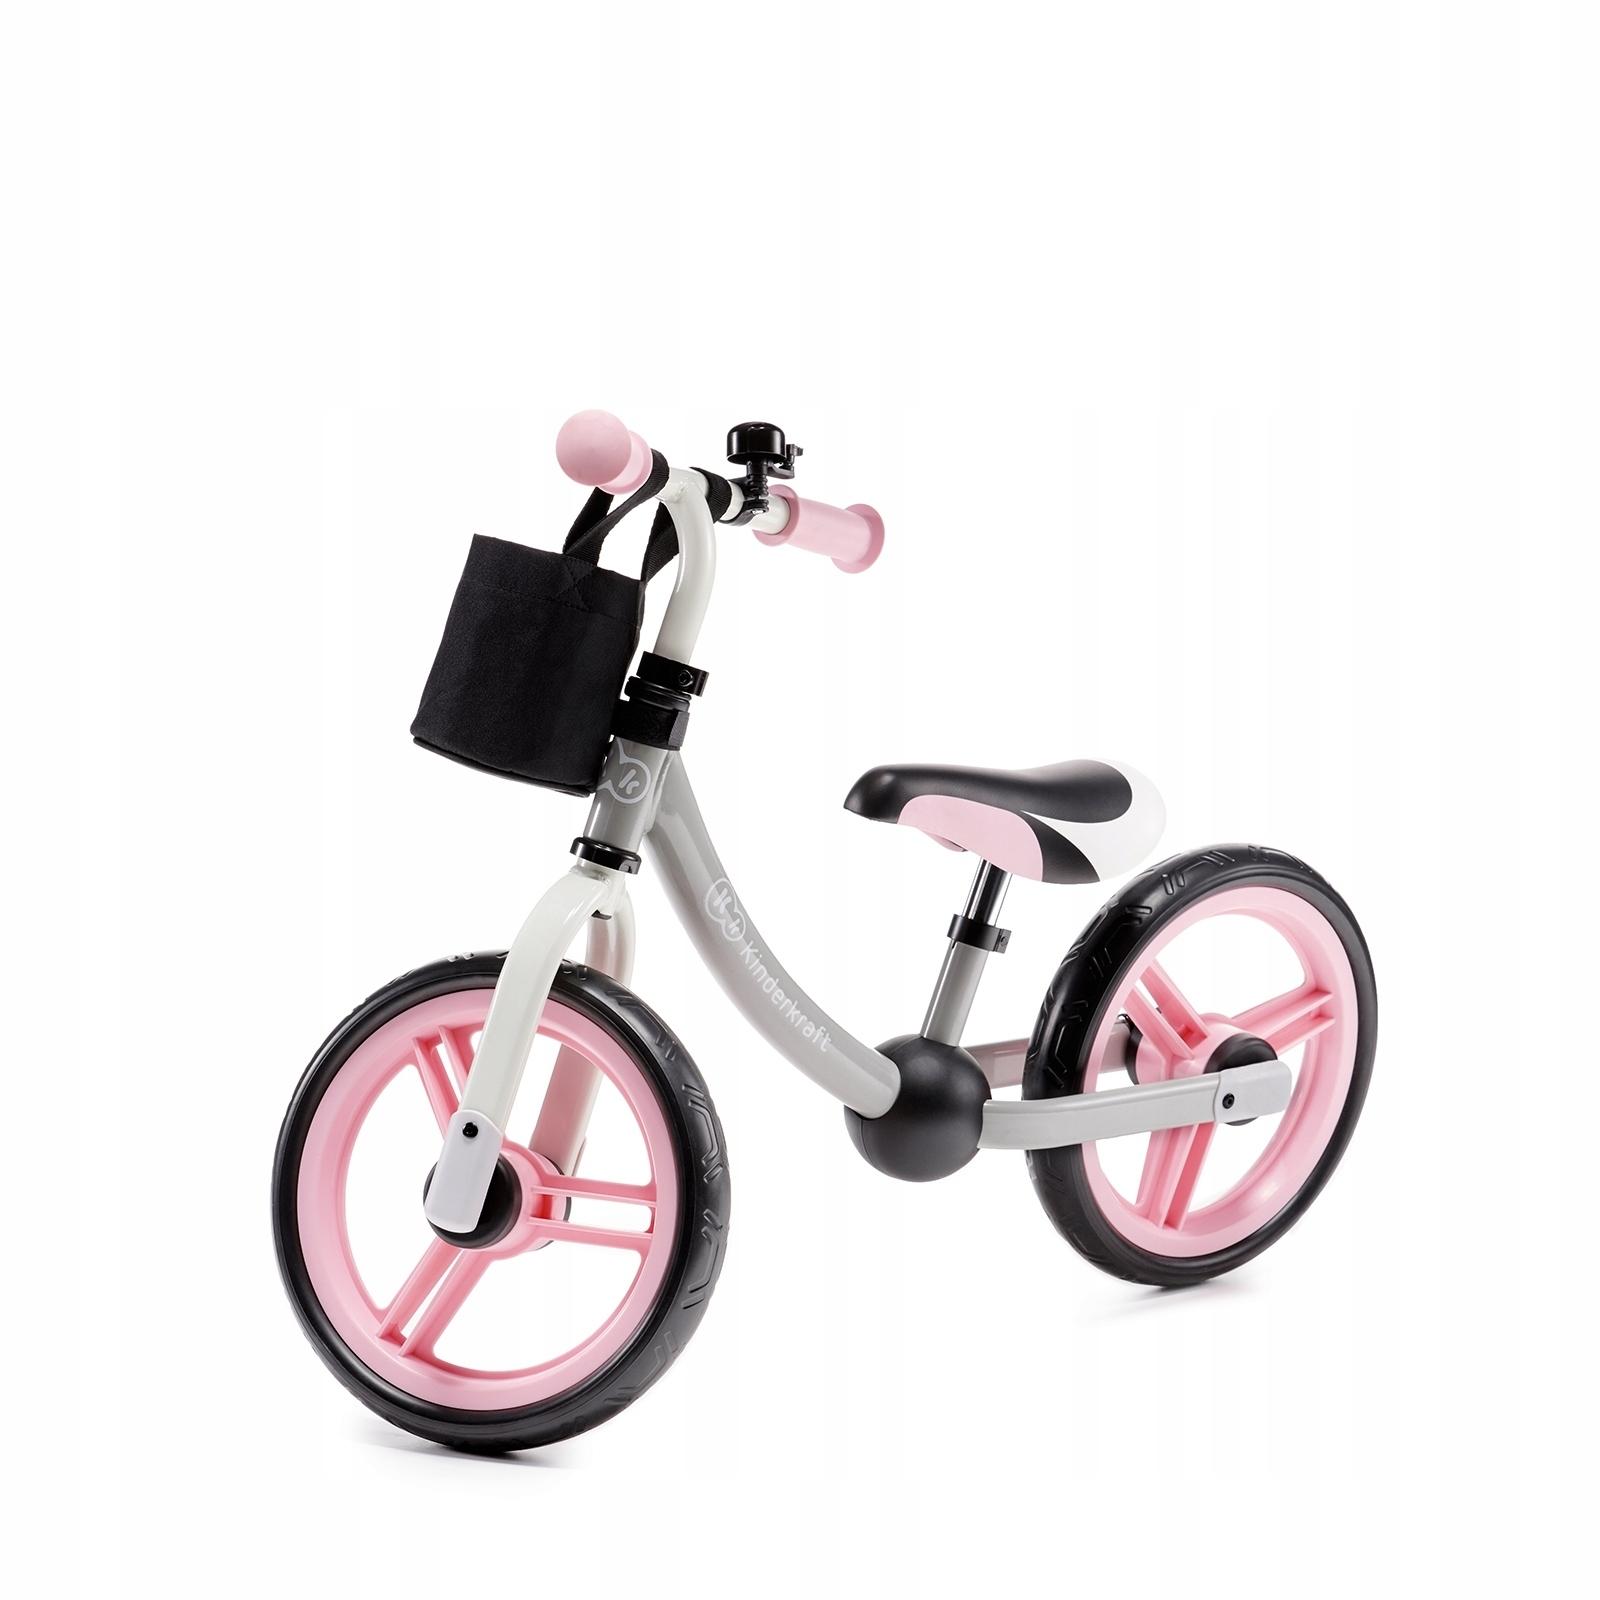 Беговел Kinderkraft 2WAY NEXT Light Pink с аксессуарами